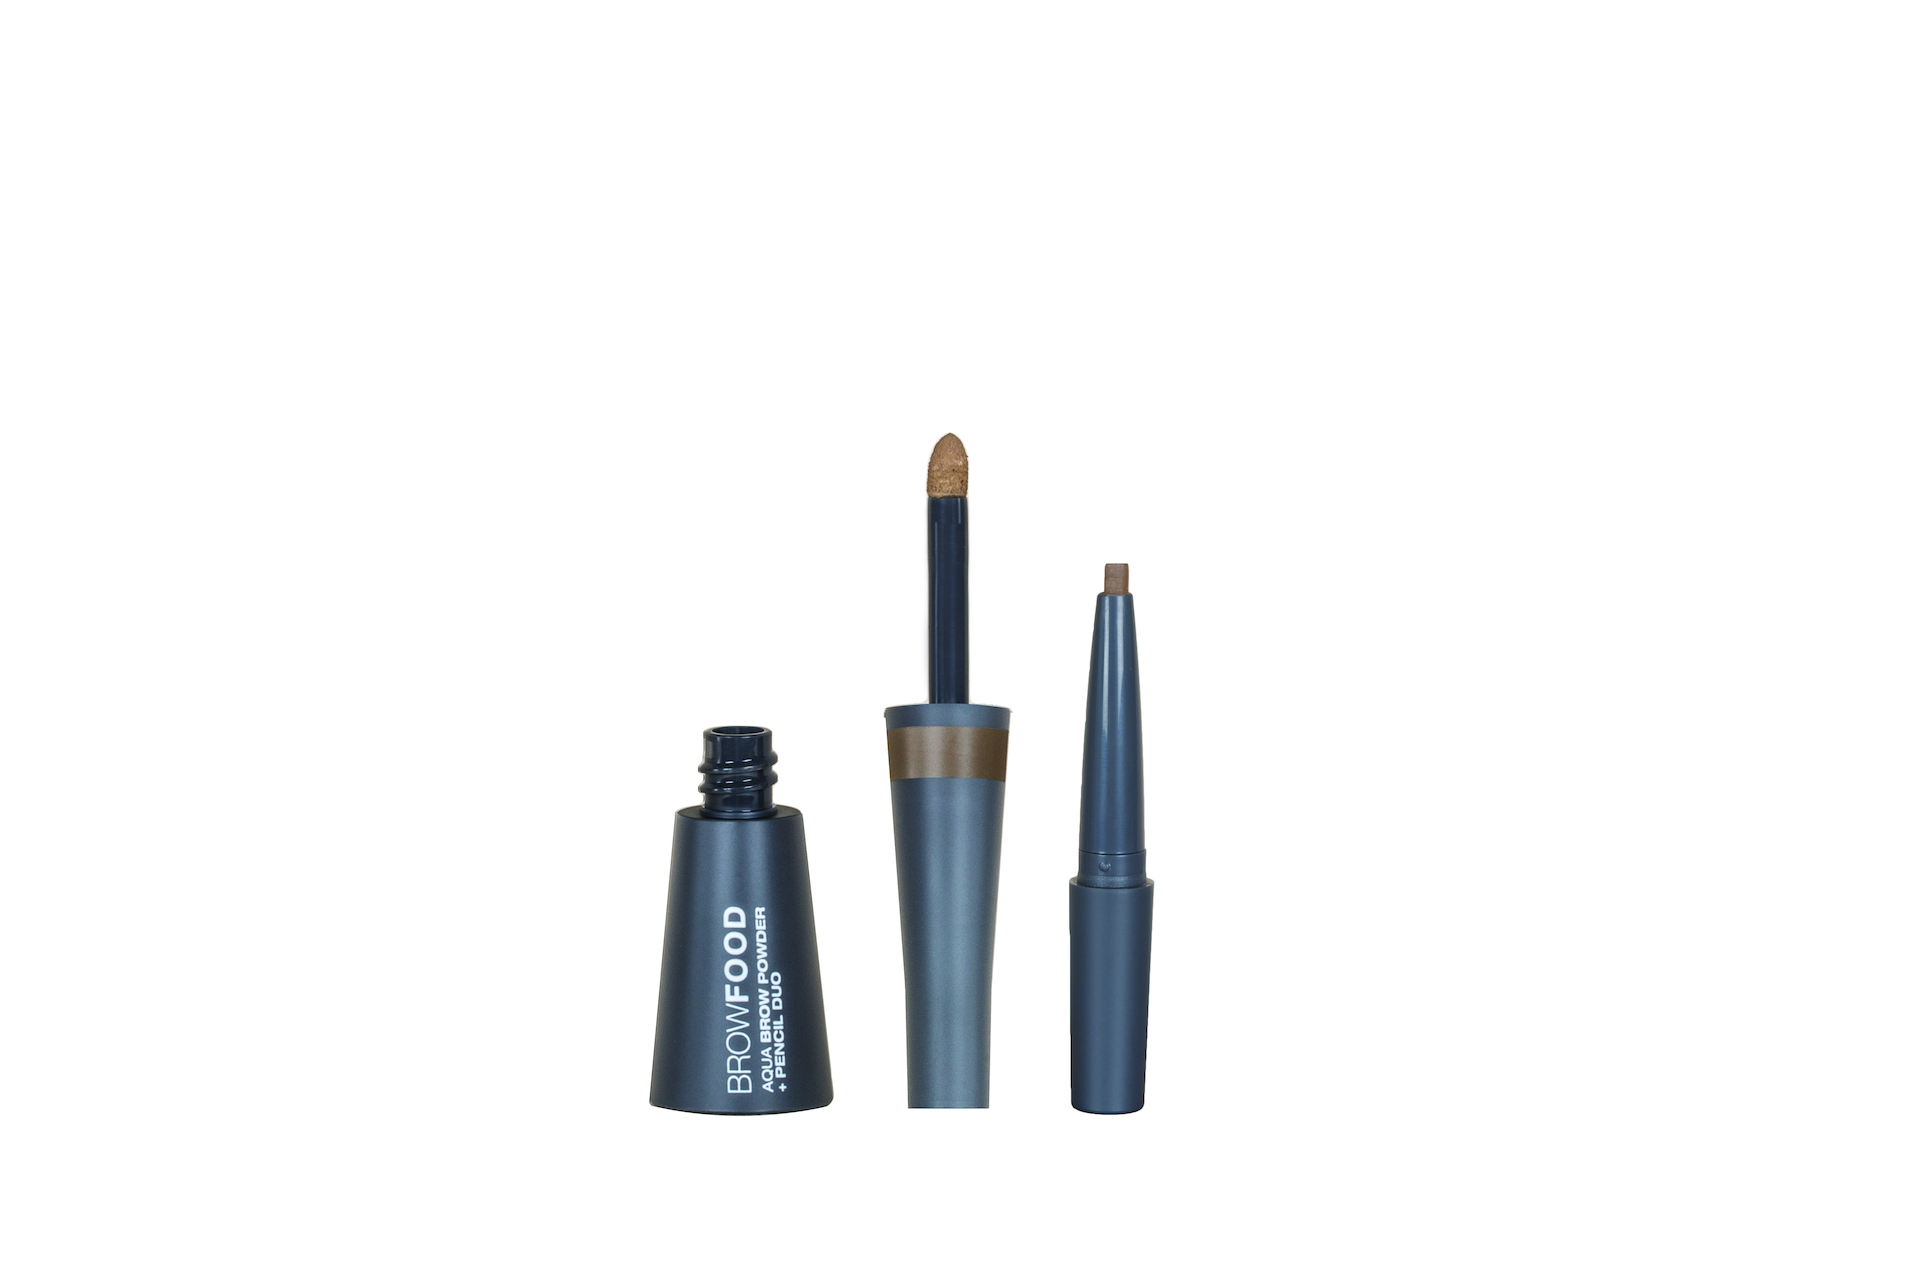 BrowFood Aqua Brow Powder + Pencil Duo Dark Blonde